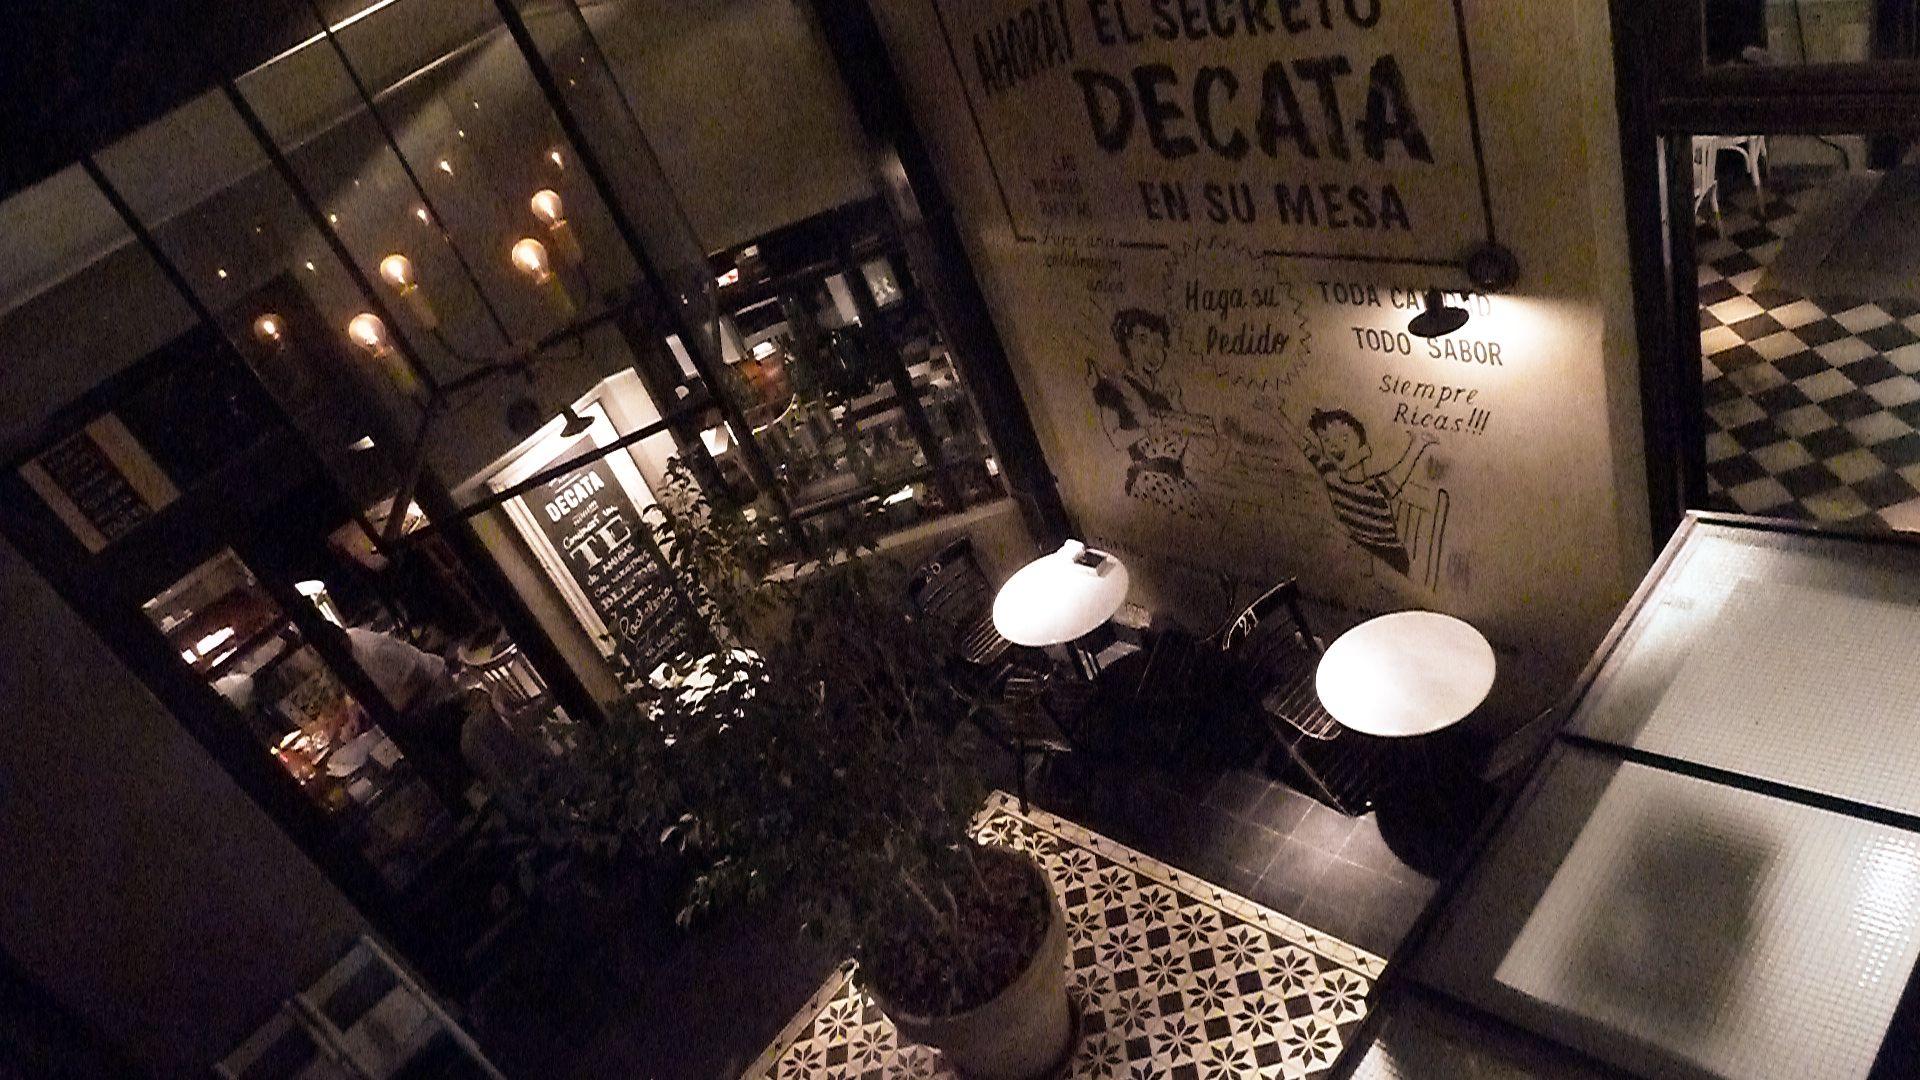 Decata, Buenos Aires